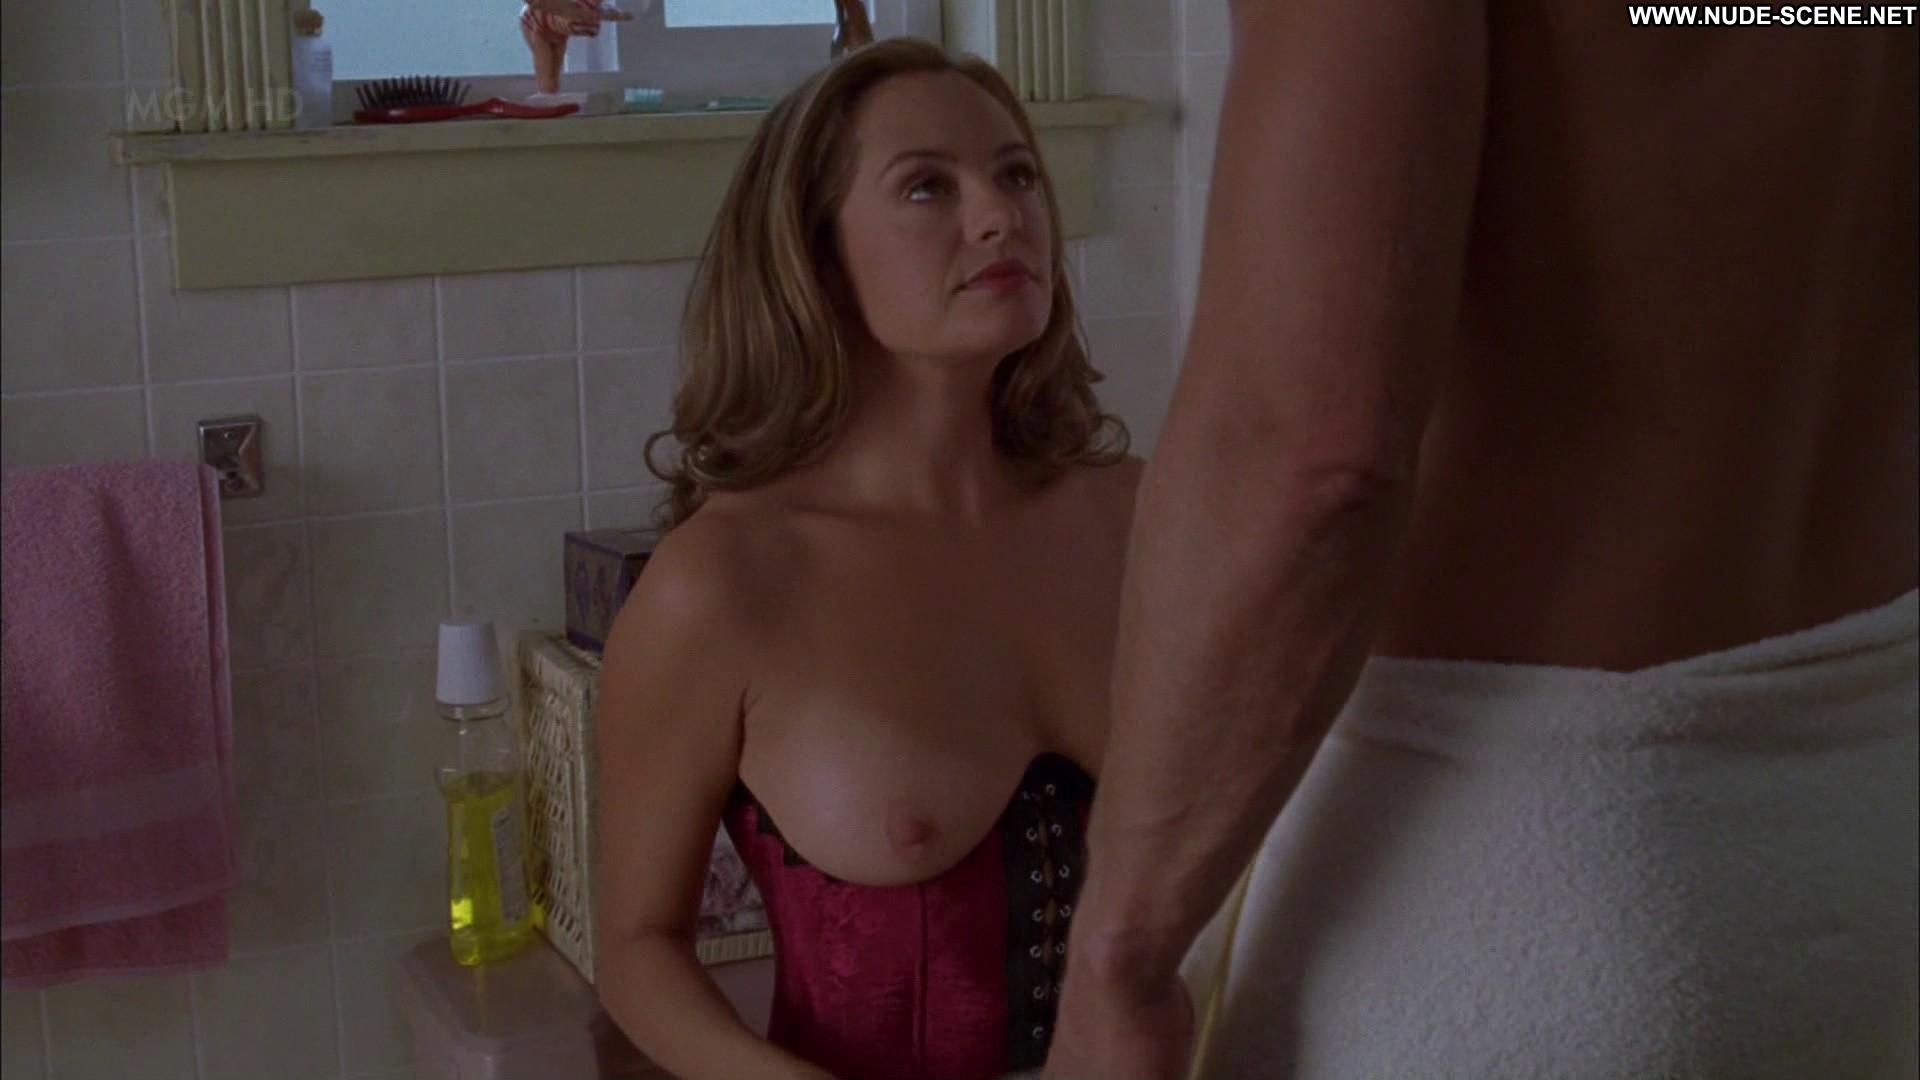 Jessica collins tits